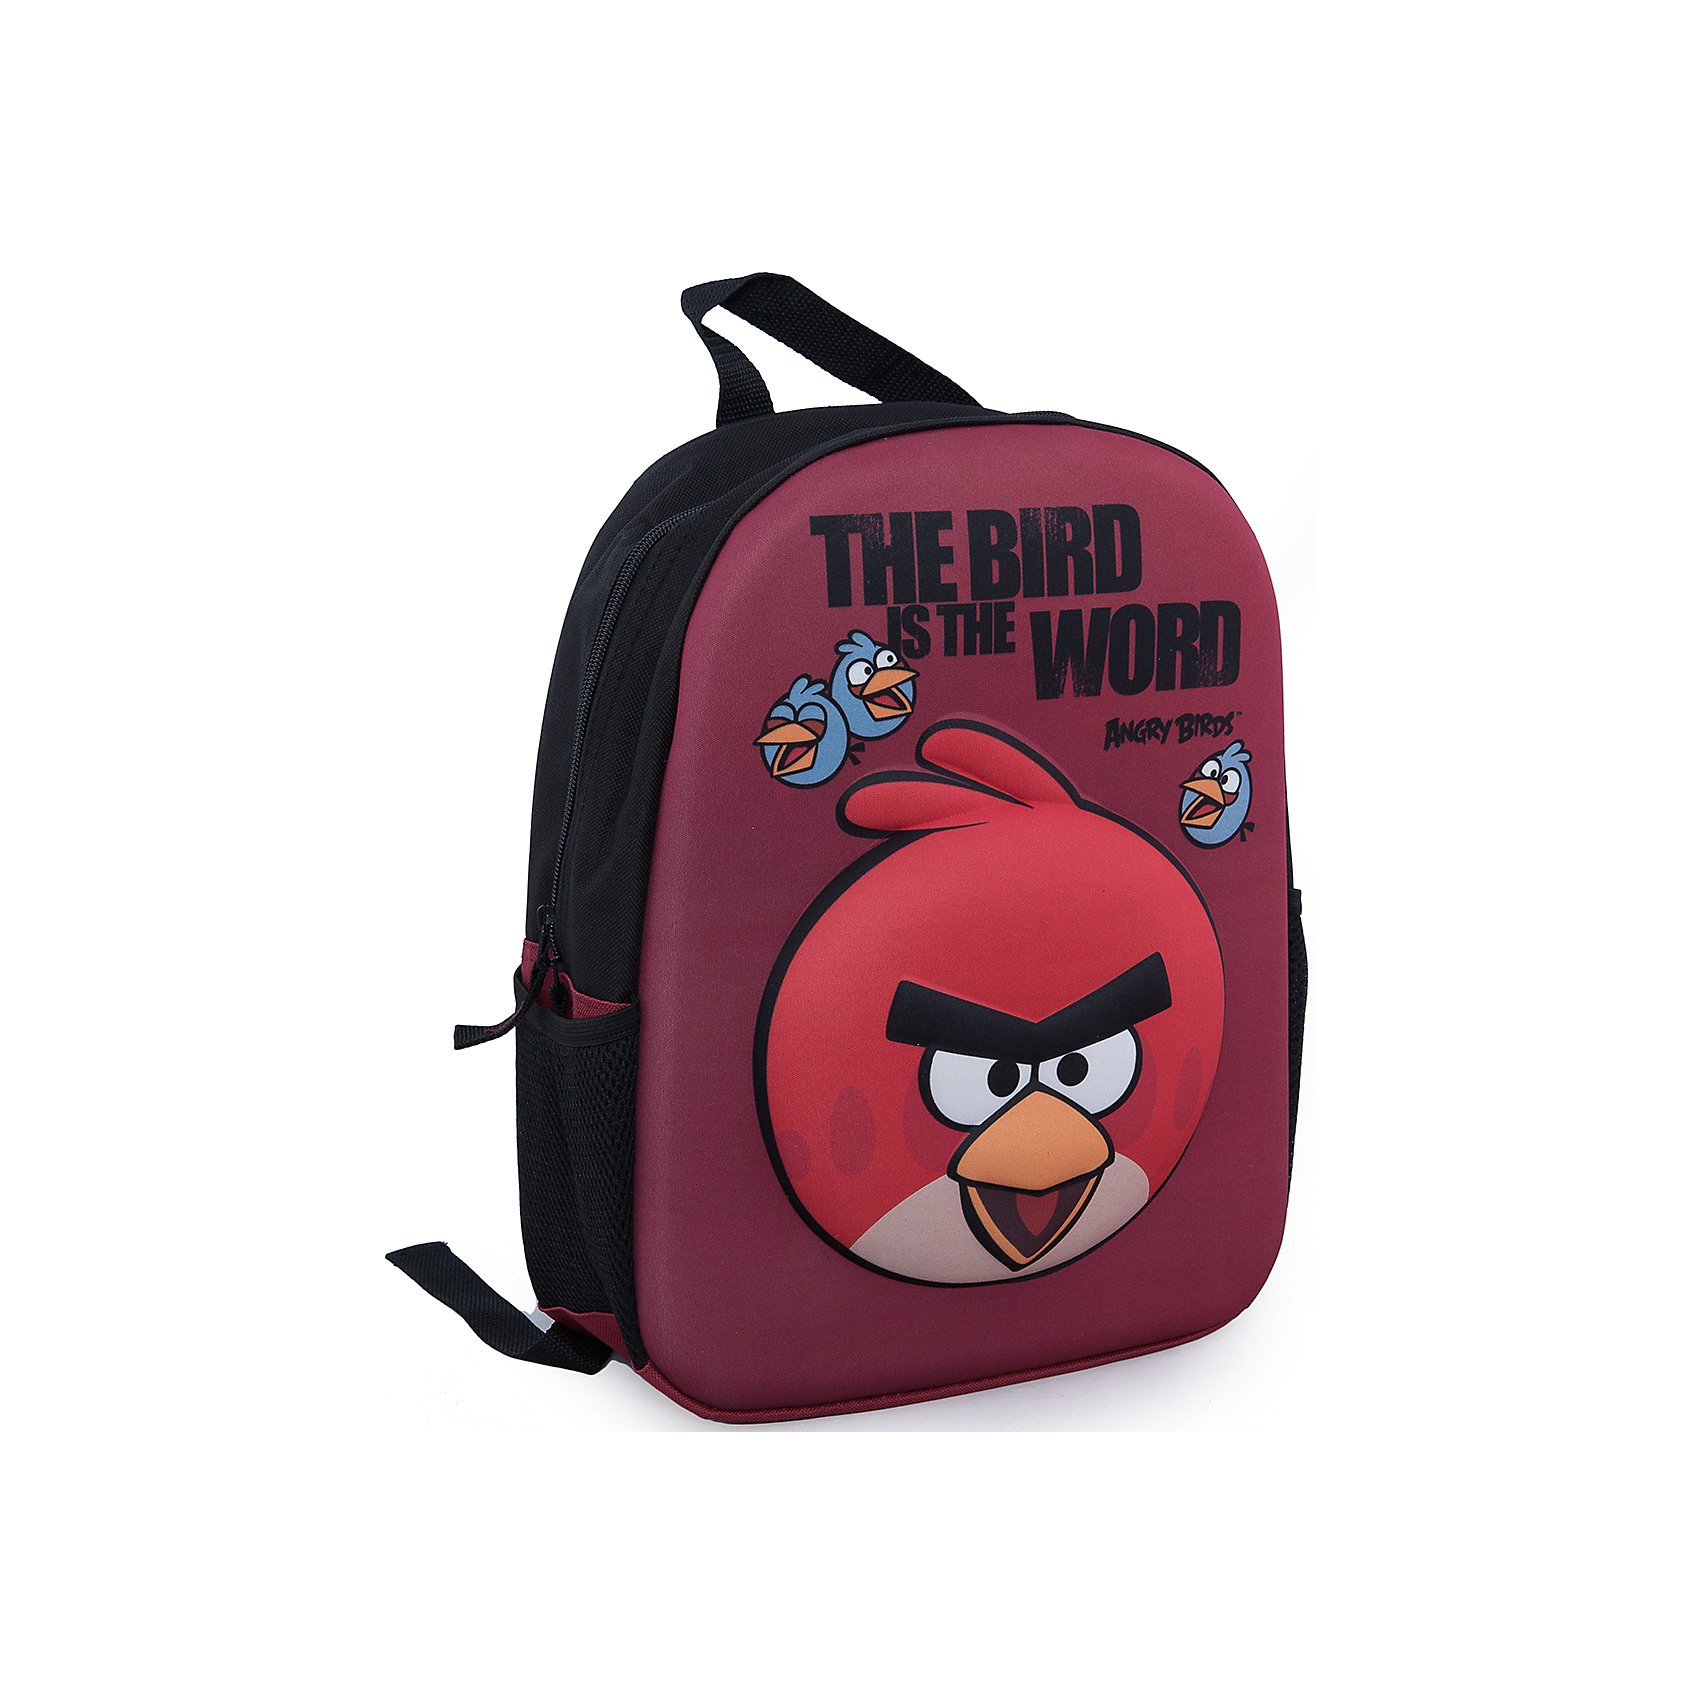 Школьный рюкзак, Angry BirdsAngry Birds<br>Рюкзак каркасный, EVA фронтальная панель.<br><br>Ширина мм: 450<br>Глубина мм: 350<br>Высота мм: 300<br>Вес г: 1000<br>Возраст от месяцев: 72<br>Возраст до месяцев: 144<br>Пол: Унисекс<br>Возраст: Детский<br>SKU: 3563430